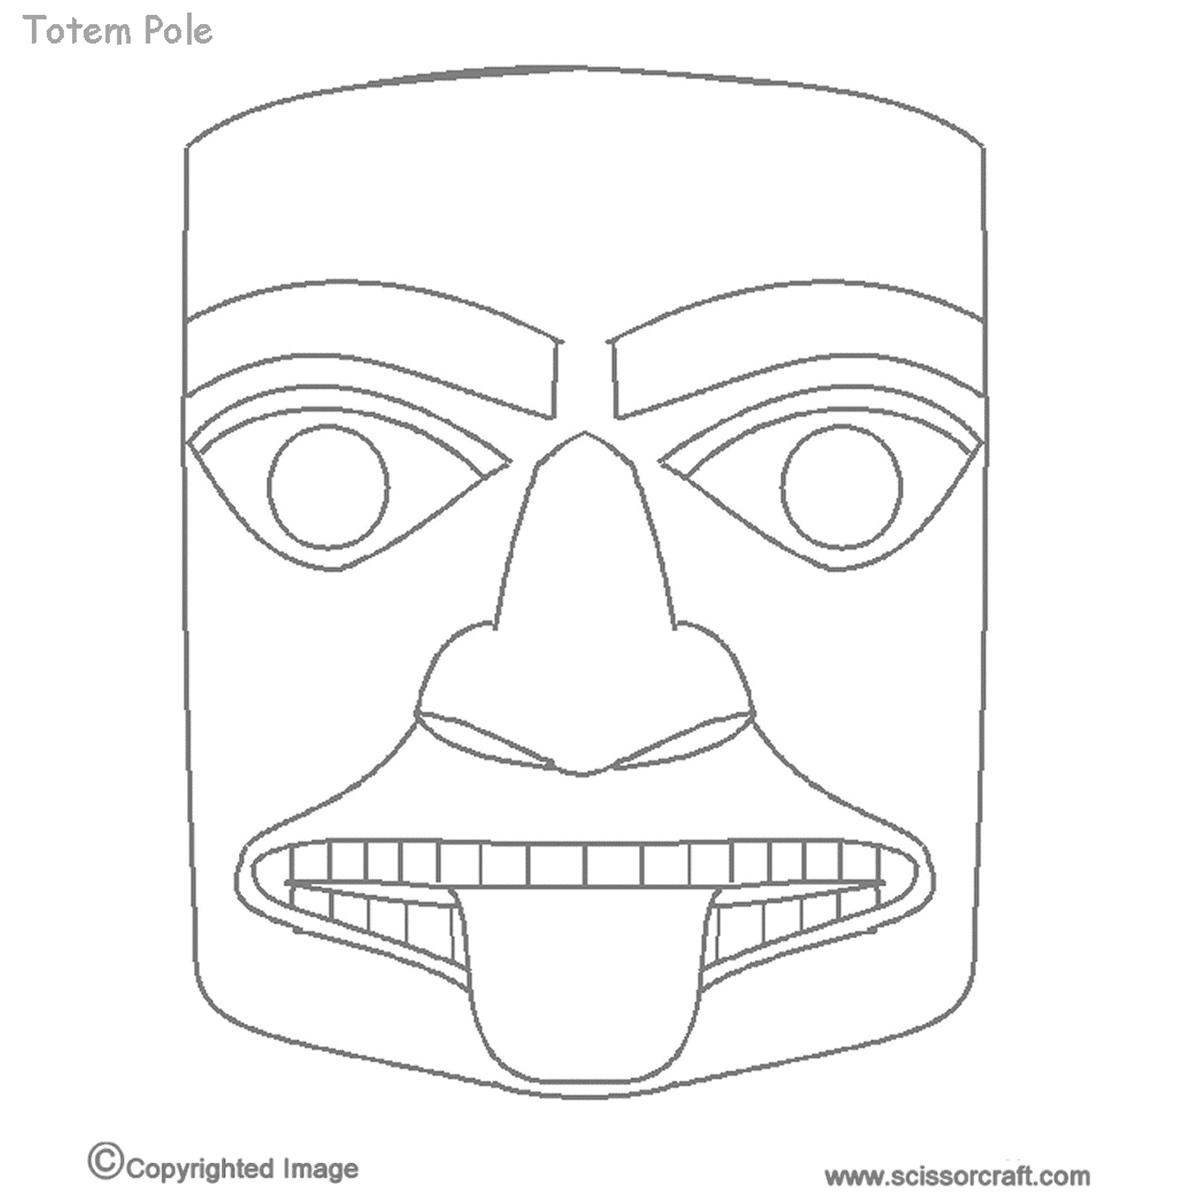 Printable Totem Pole Animals